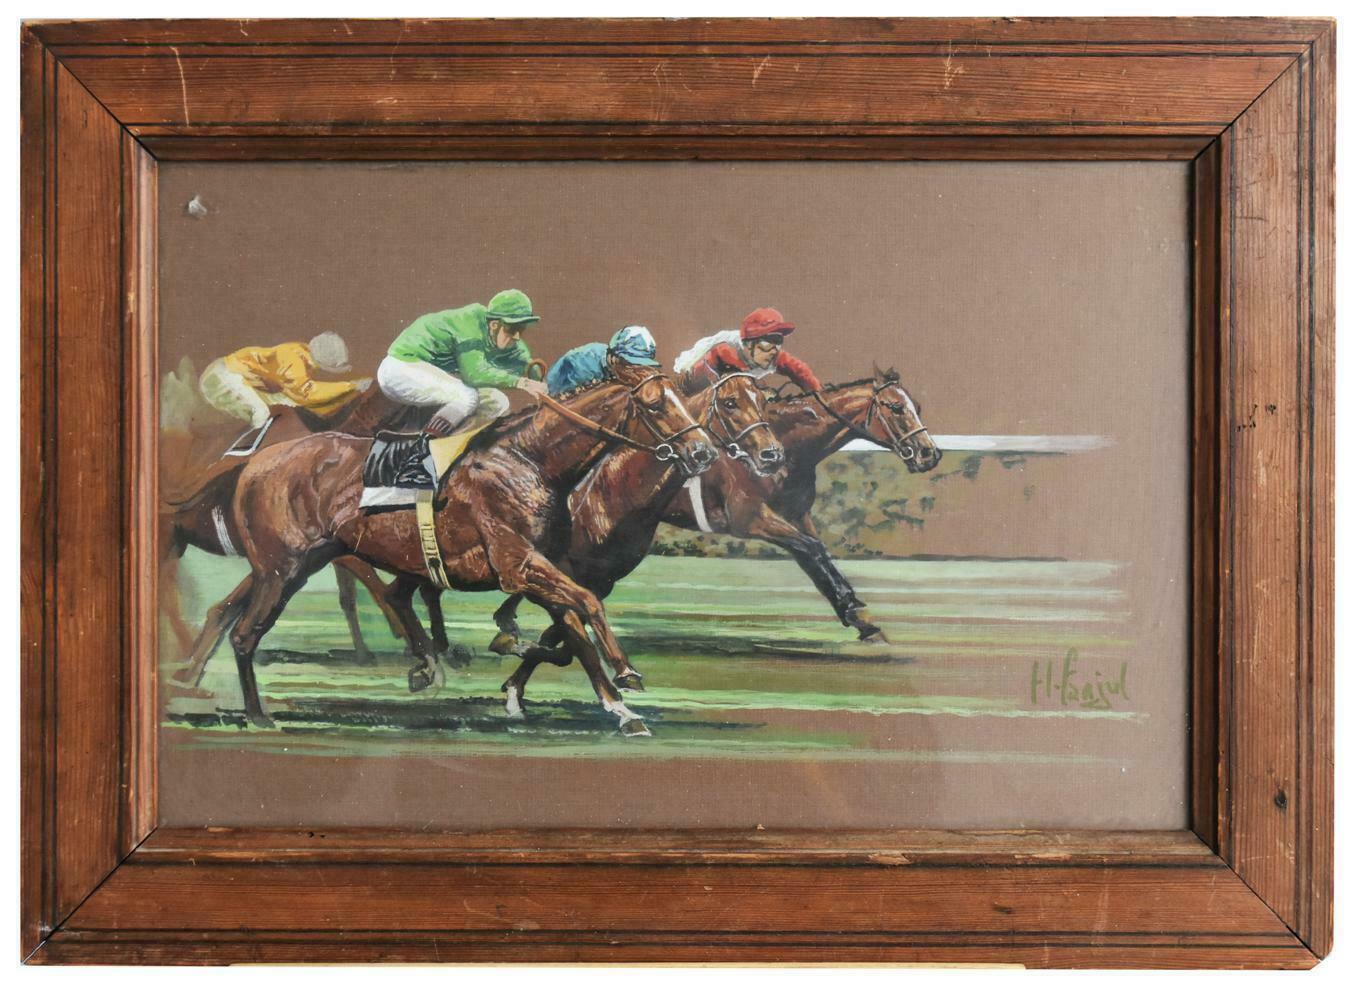 Horse Racing Watercolor by Henri Fanjul